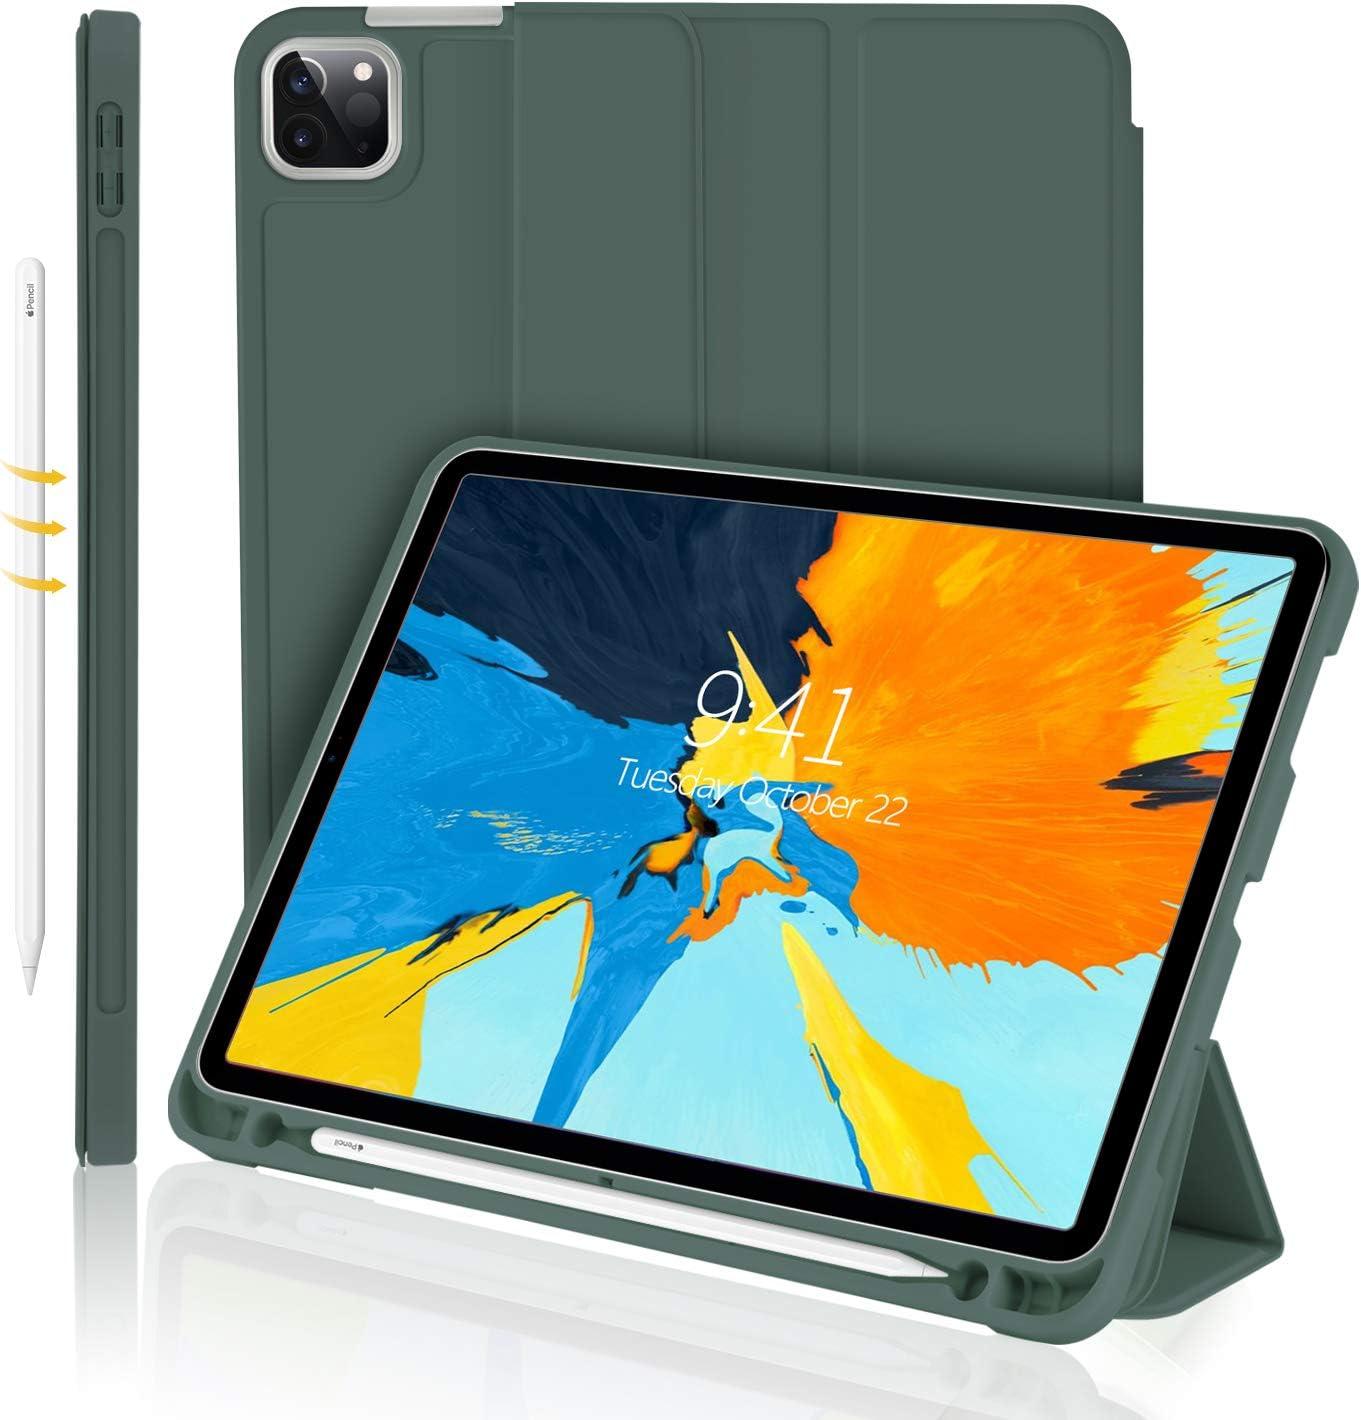 Funda iMieet para iPad Pro 11 2020 2da Gen / 2018 (NVD4)